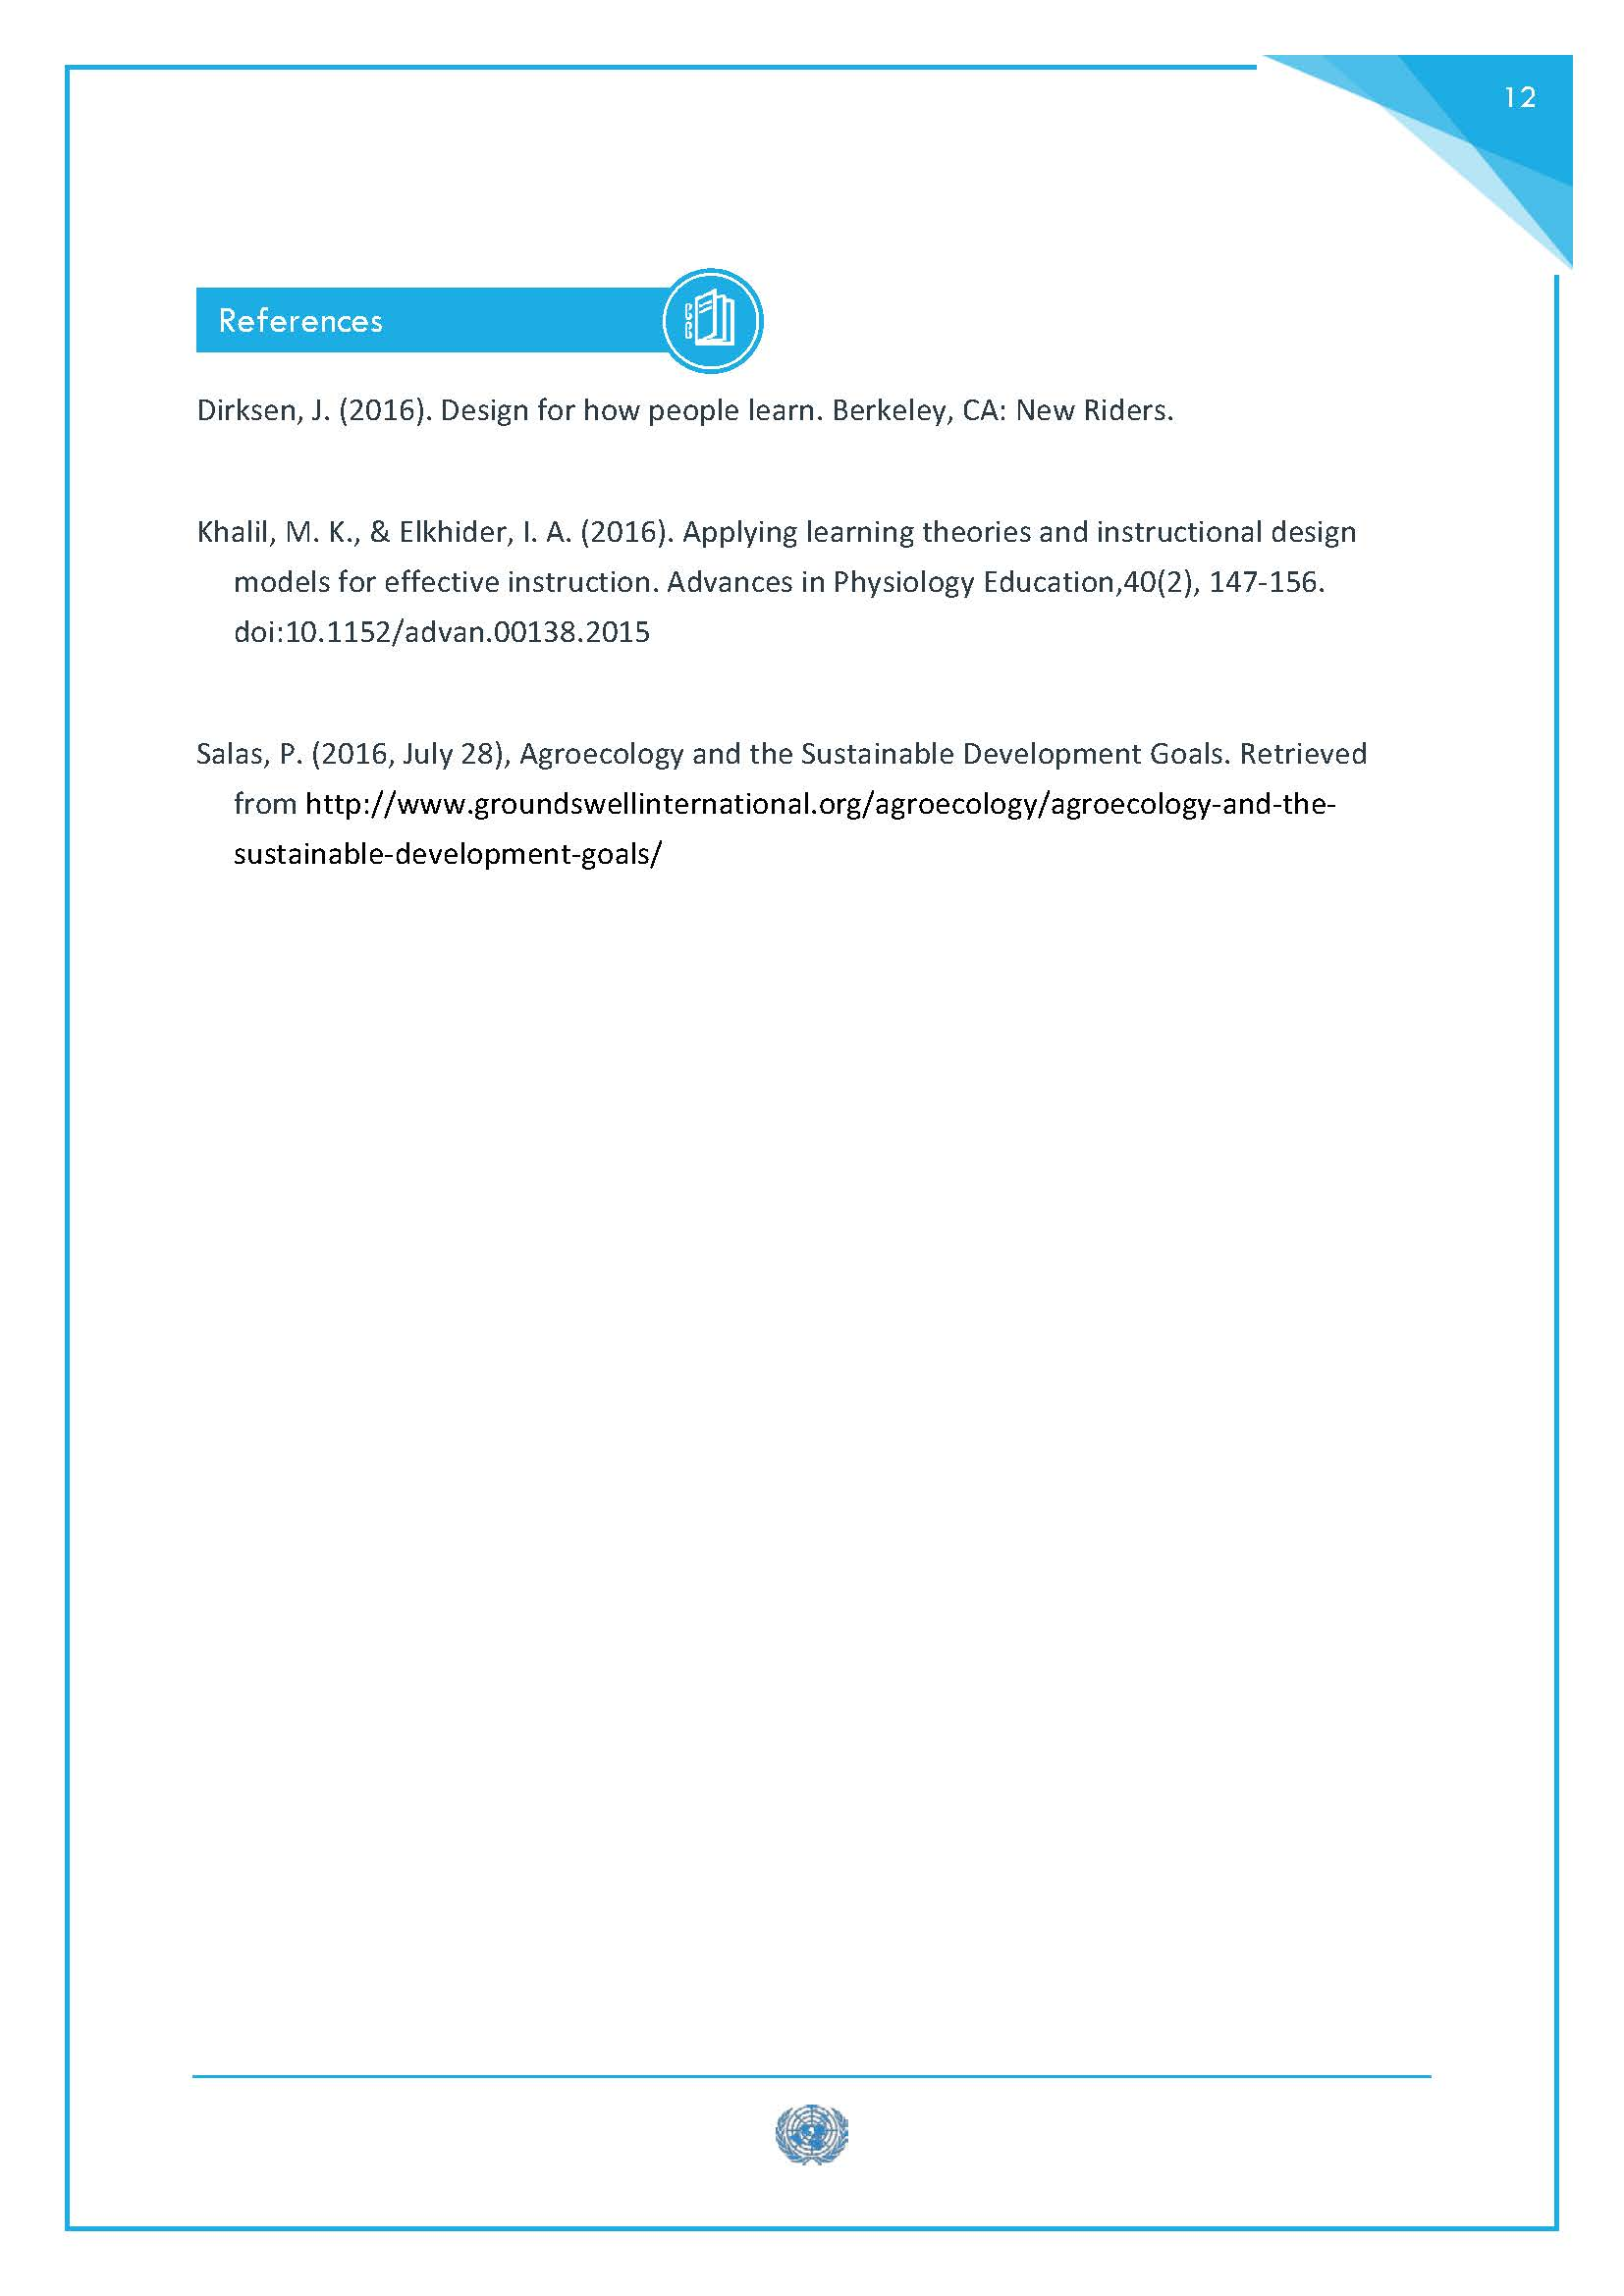 Design Document_Kraus&Beatty_Page_13.jpg